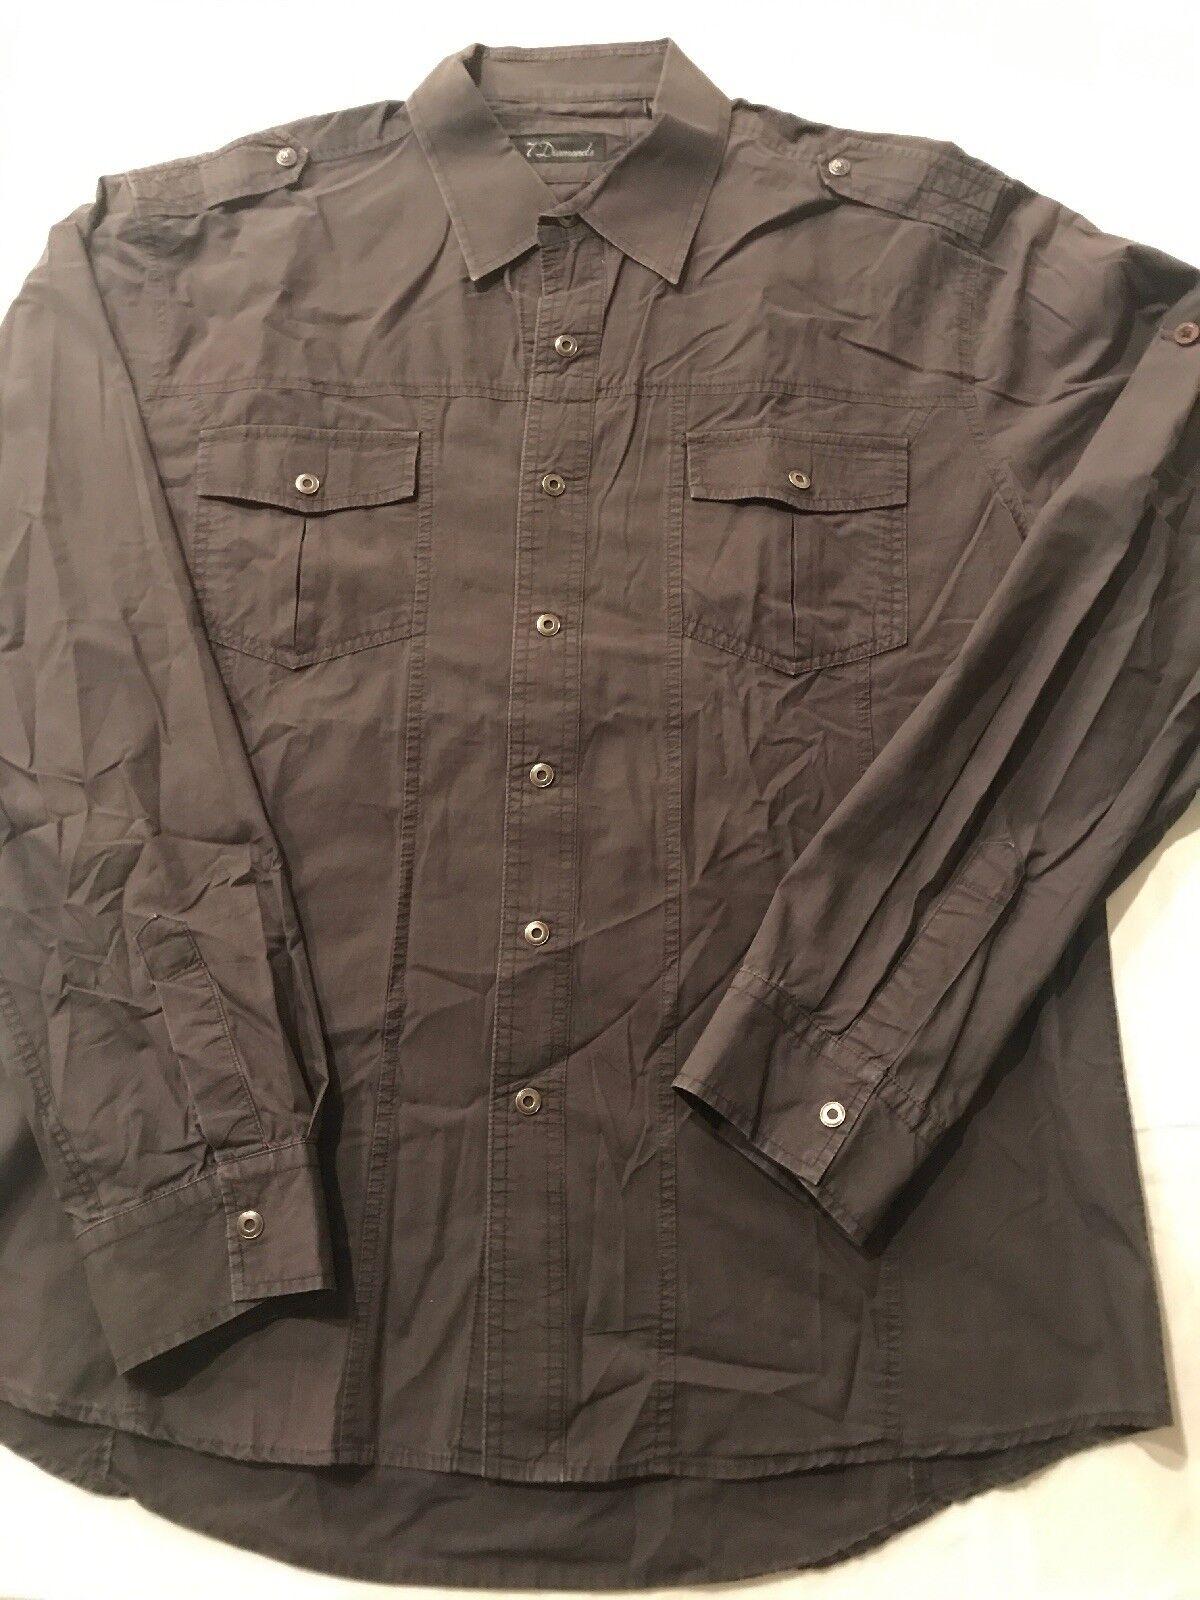 17169e5f 7 DIAMONDS Mens XXL 100% Cotton Long Sleeve Snap Front Brown TS8 Shirt  noadtz524-Casual Button-Down Shirts